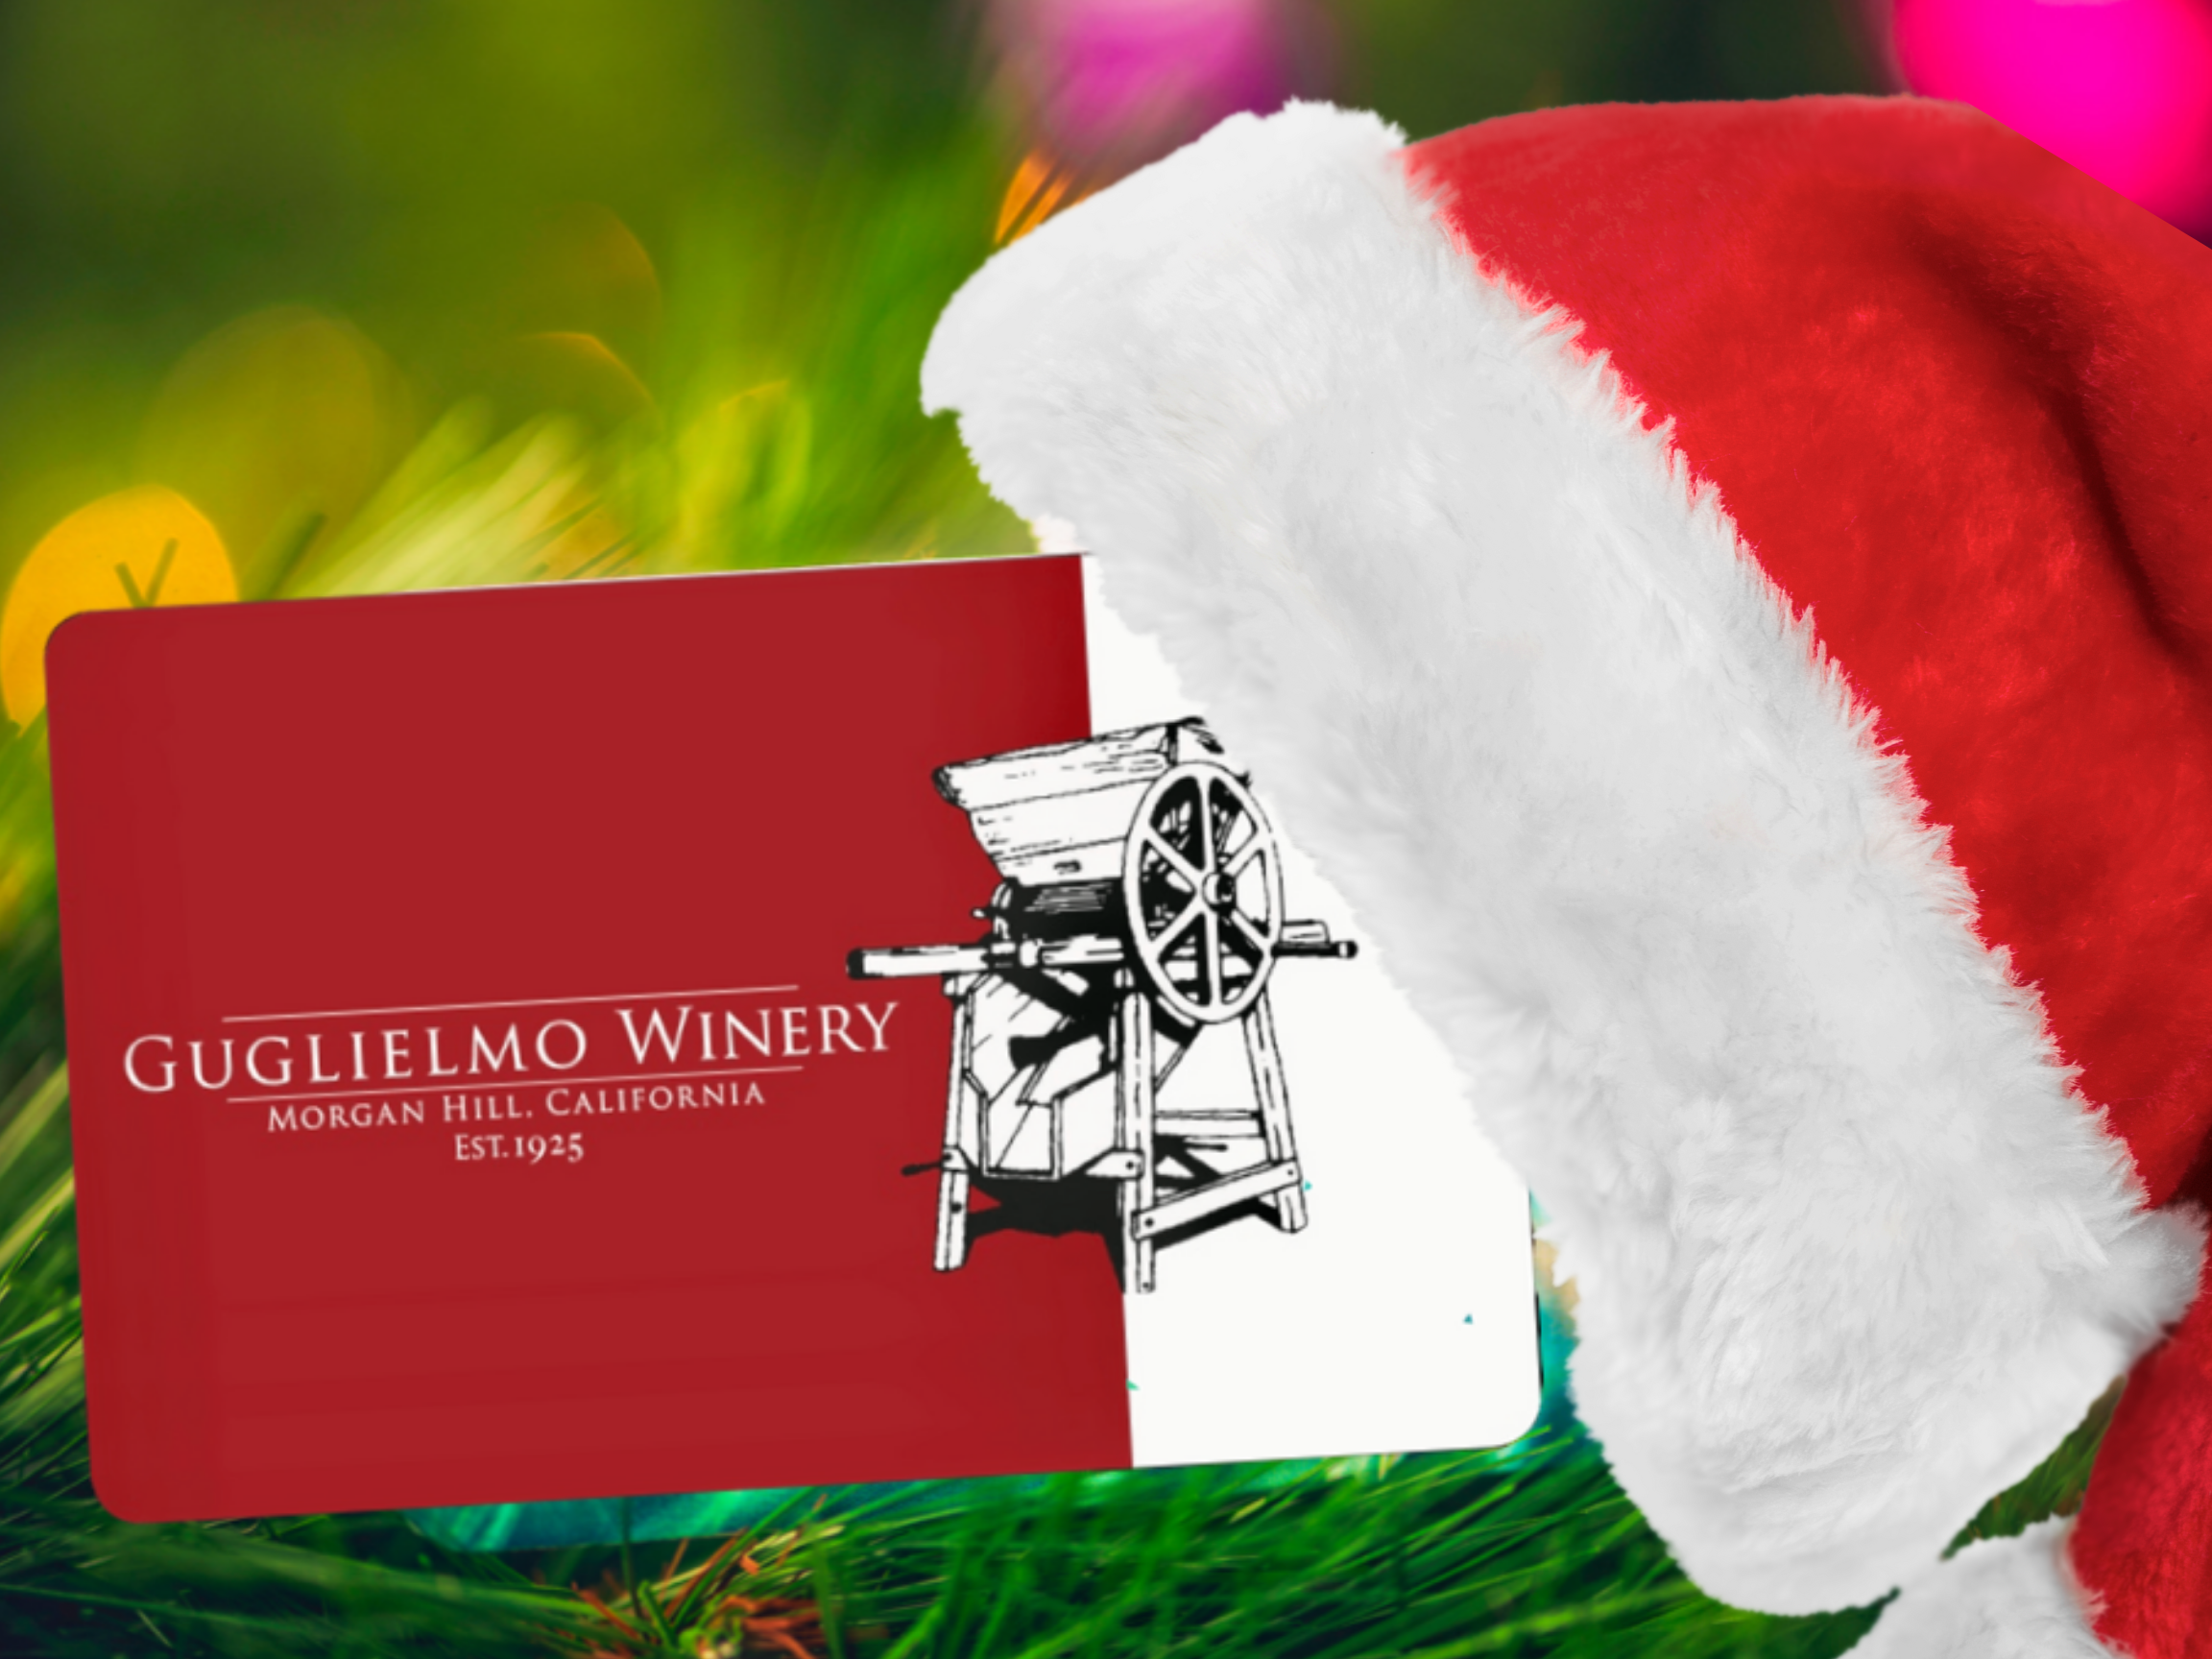 Guglielmo winery Gift Card